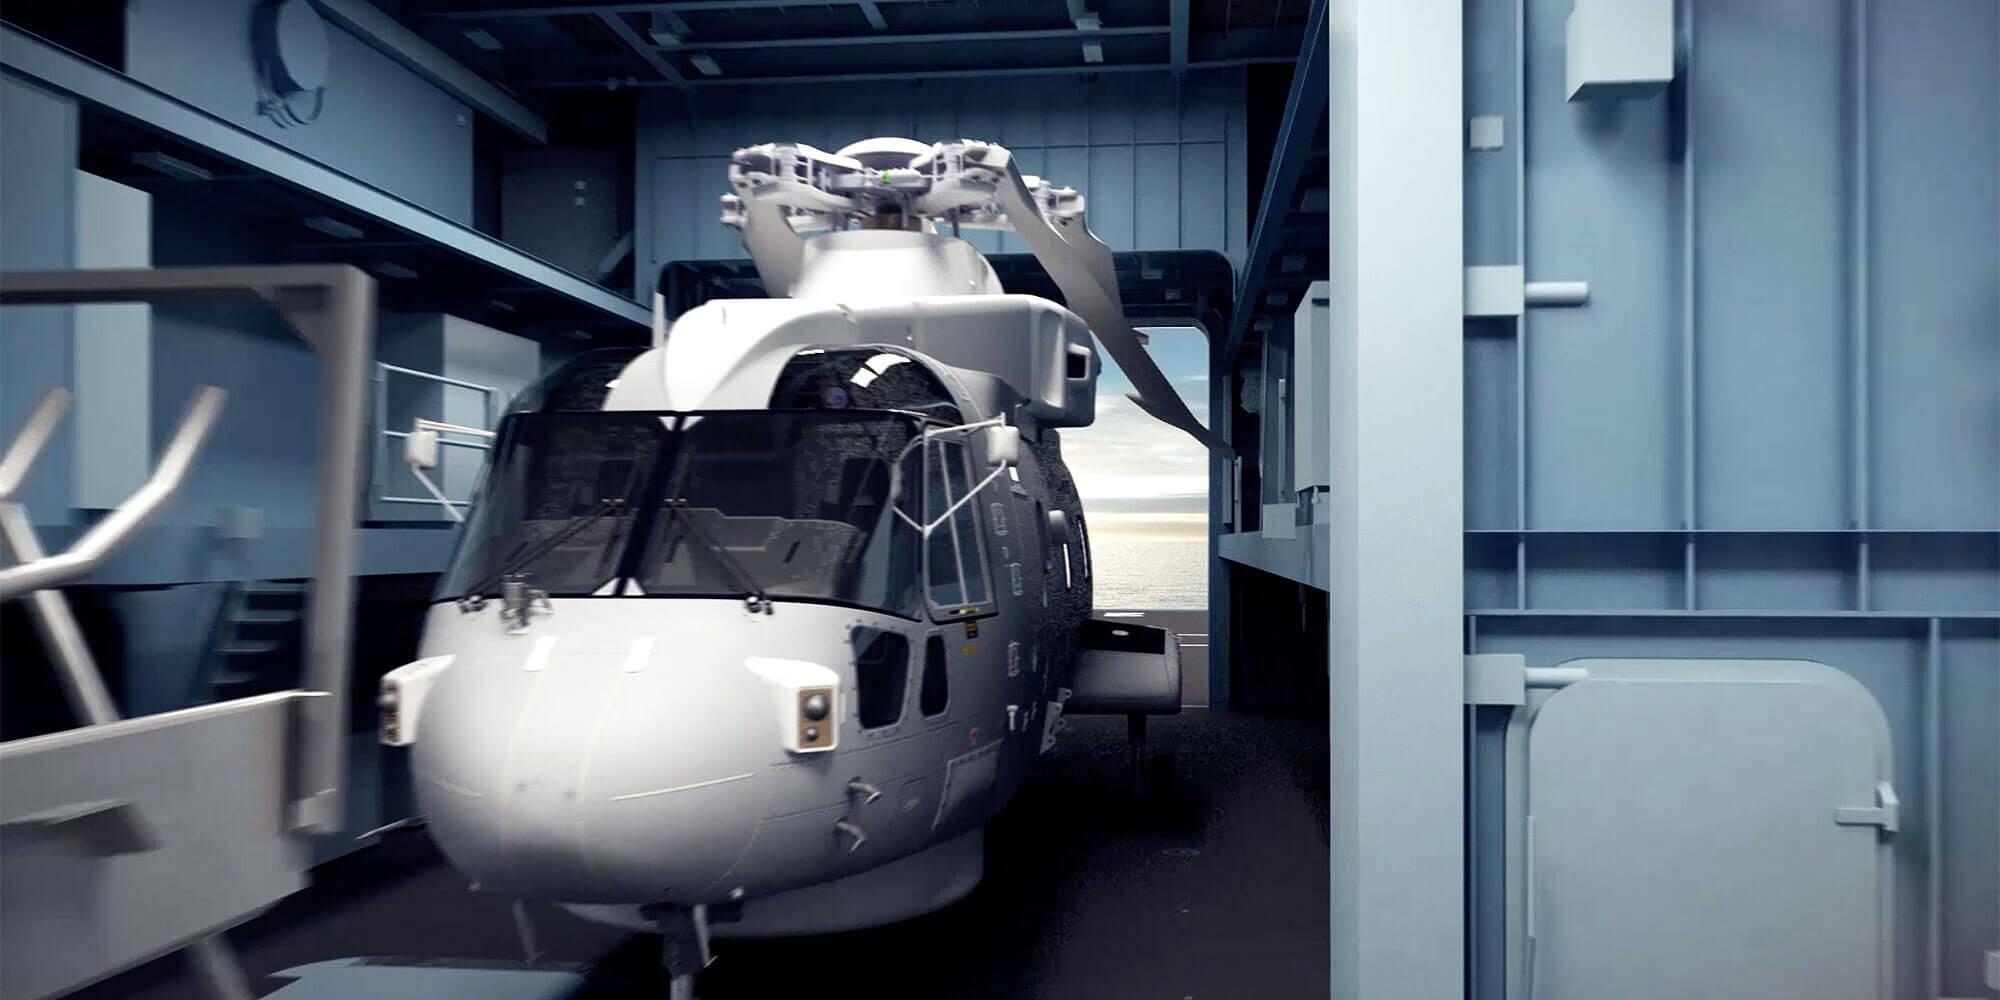 Type 26 frigate hangar Merlin helicopter